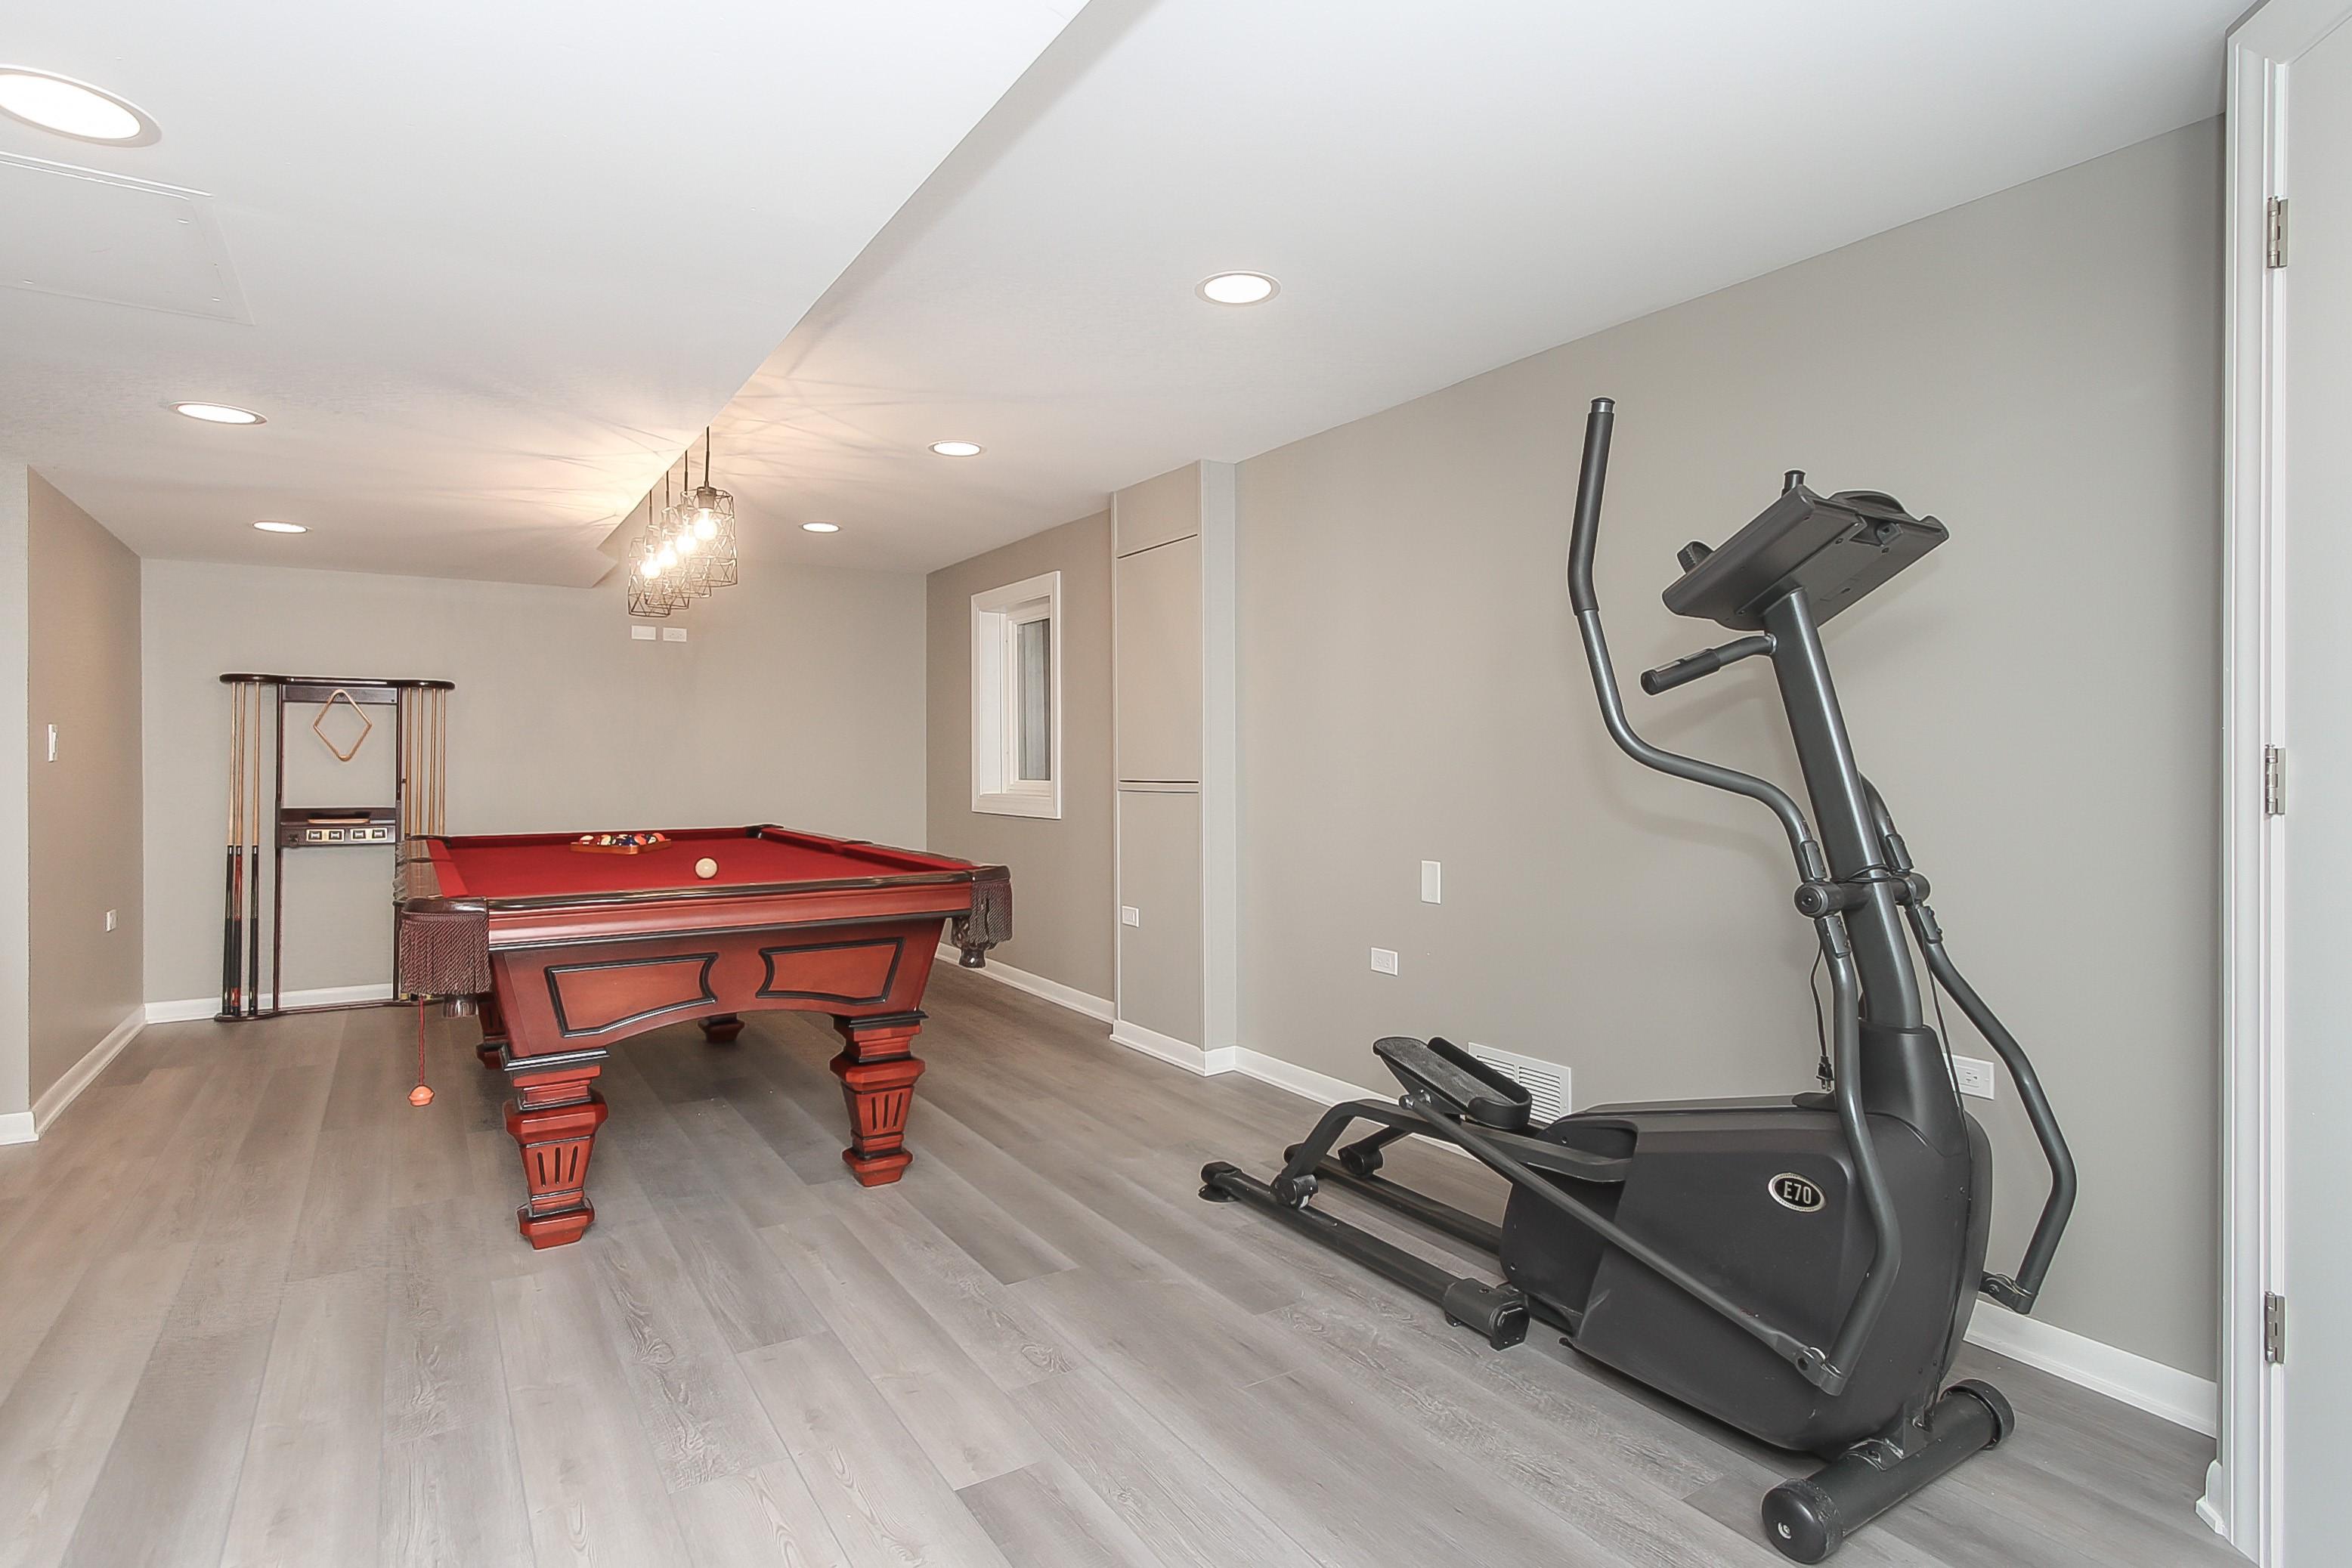 Game-Room-Fitness-Studio-Remodel-Arlington-Heights